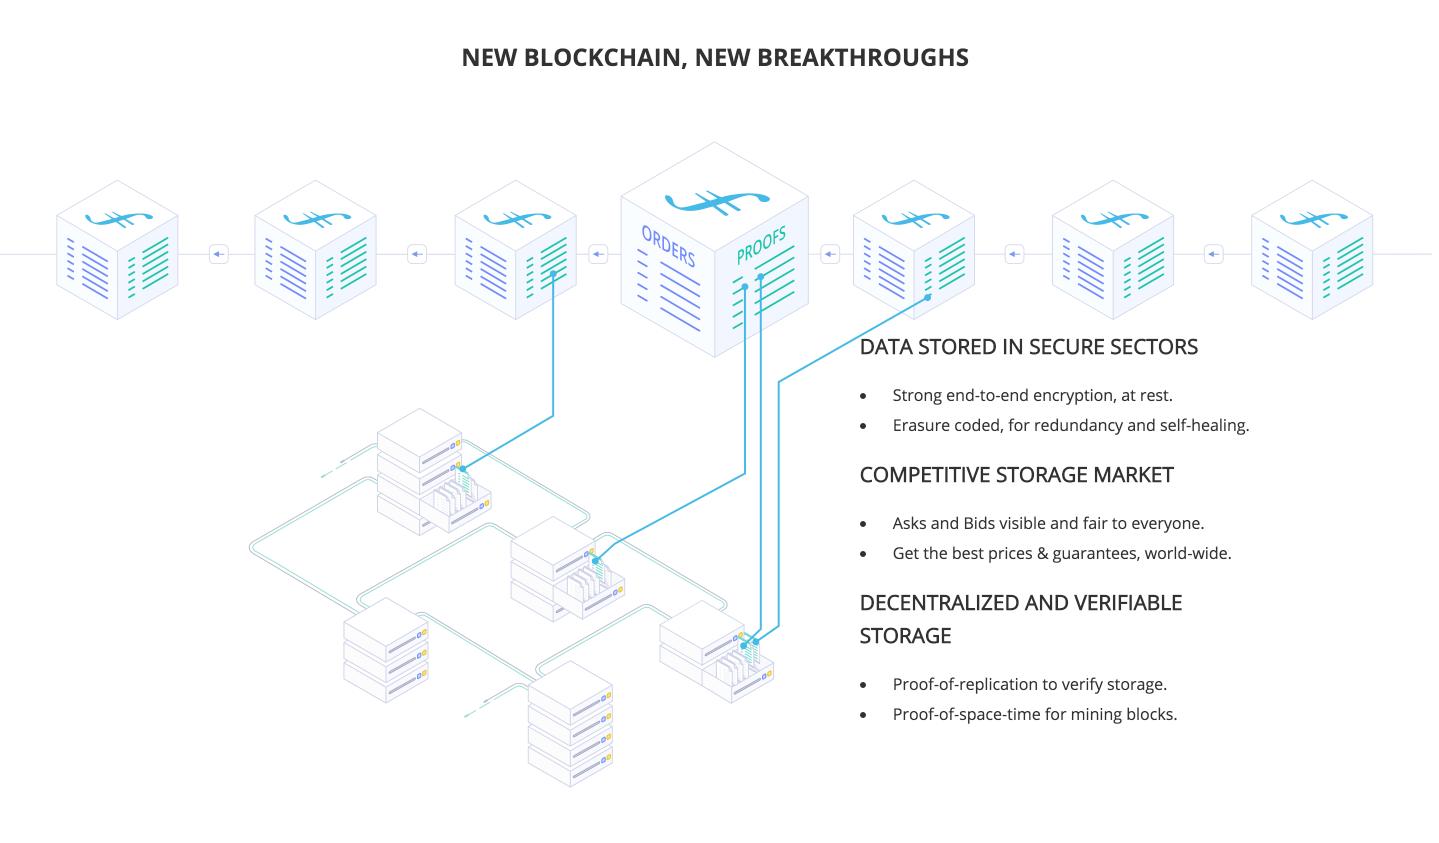 New blockchain, new breakthroughs